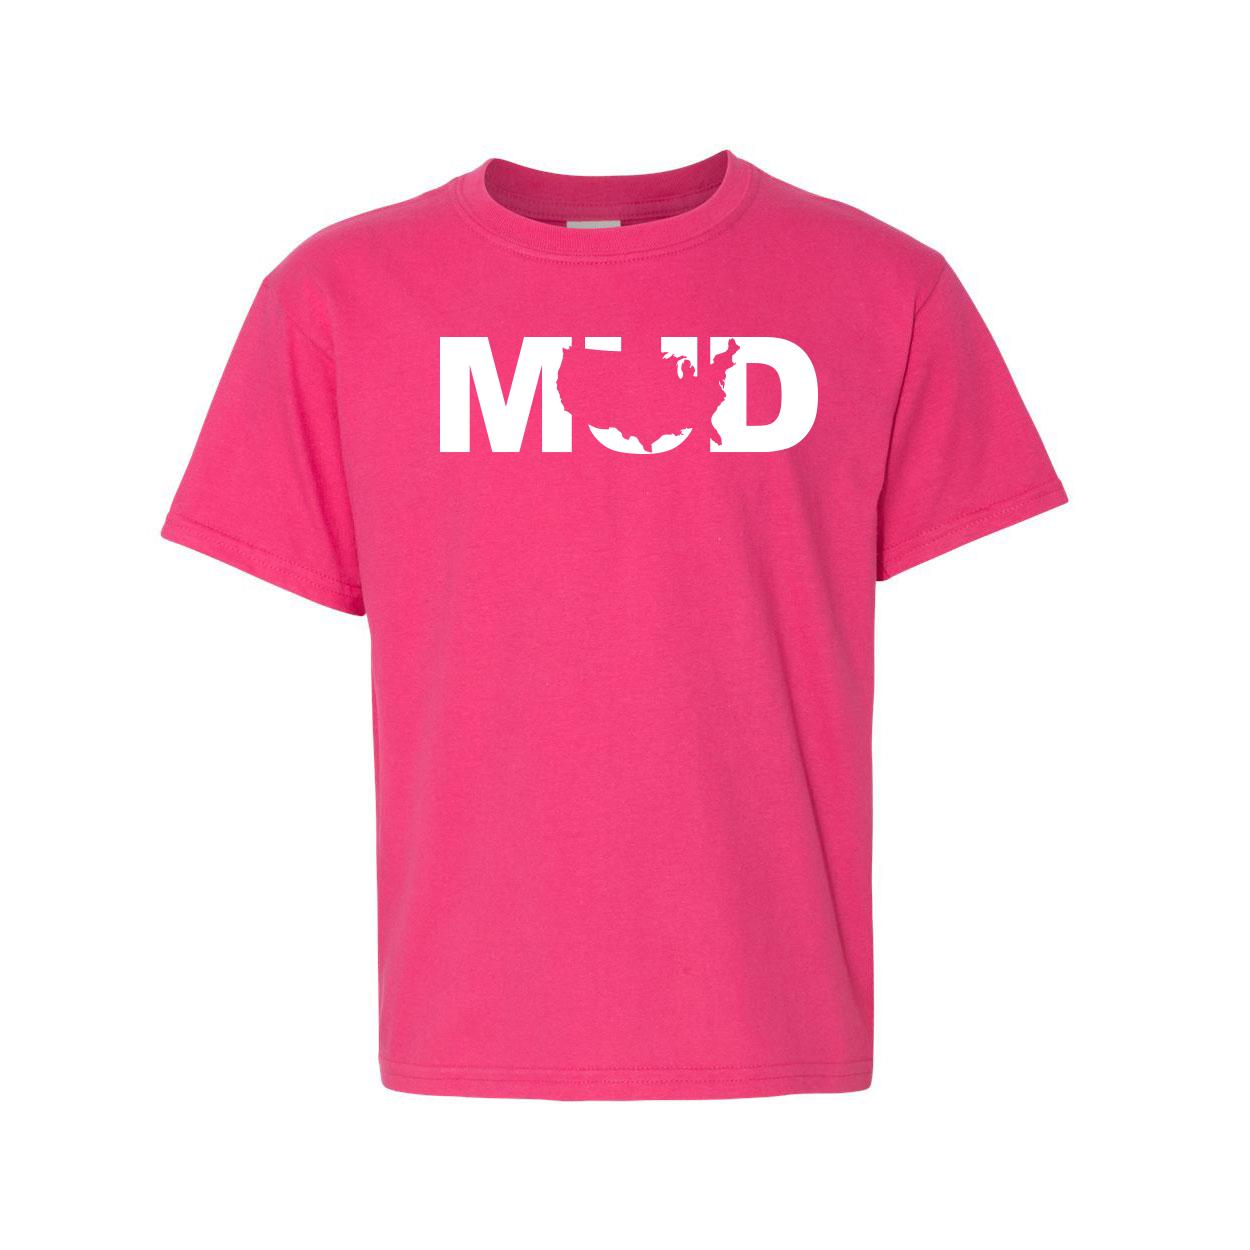 Mud United States Classic Youth T-Shirt Pink (White Logo)